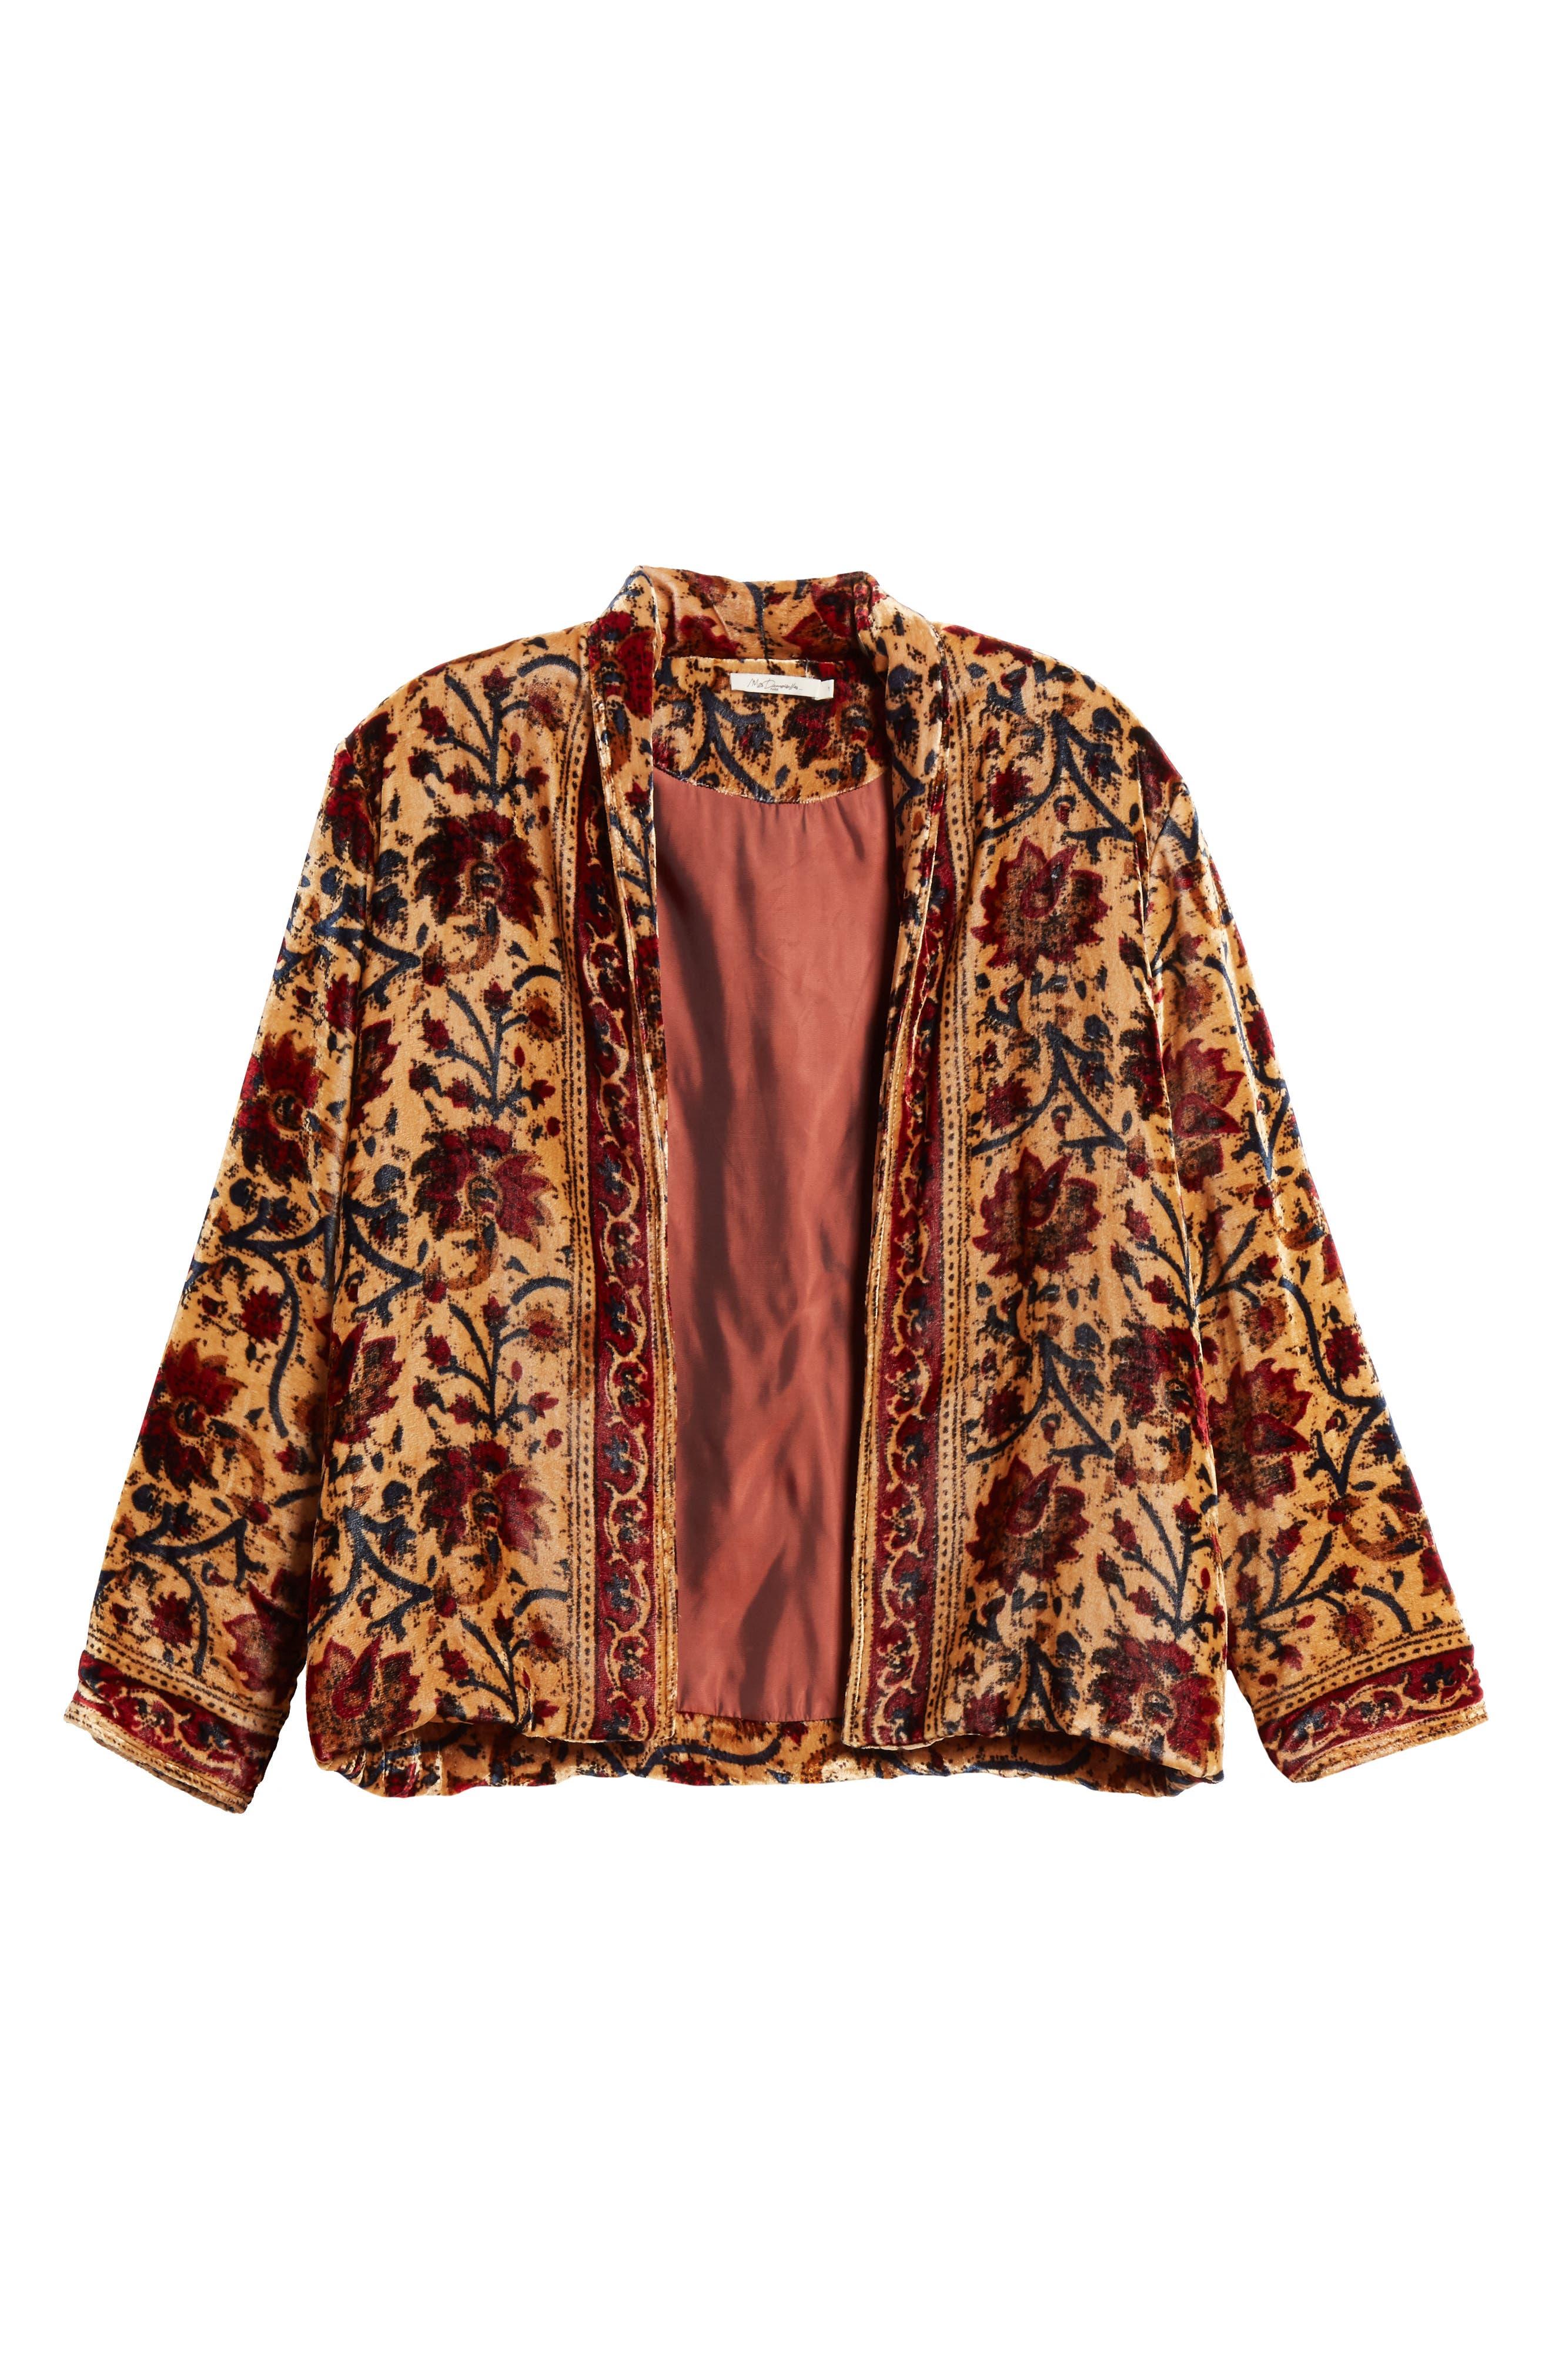 Charles Floral Cotton Velvet Jacket,                             Alternate thumbnail 6, color,                             291